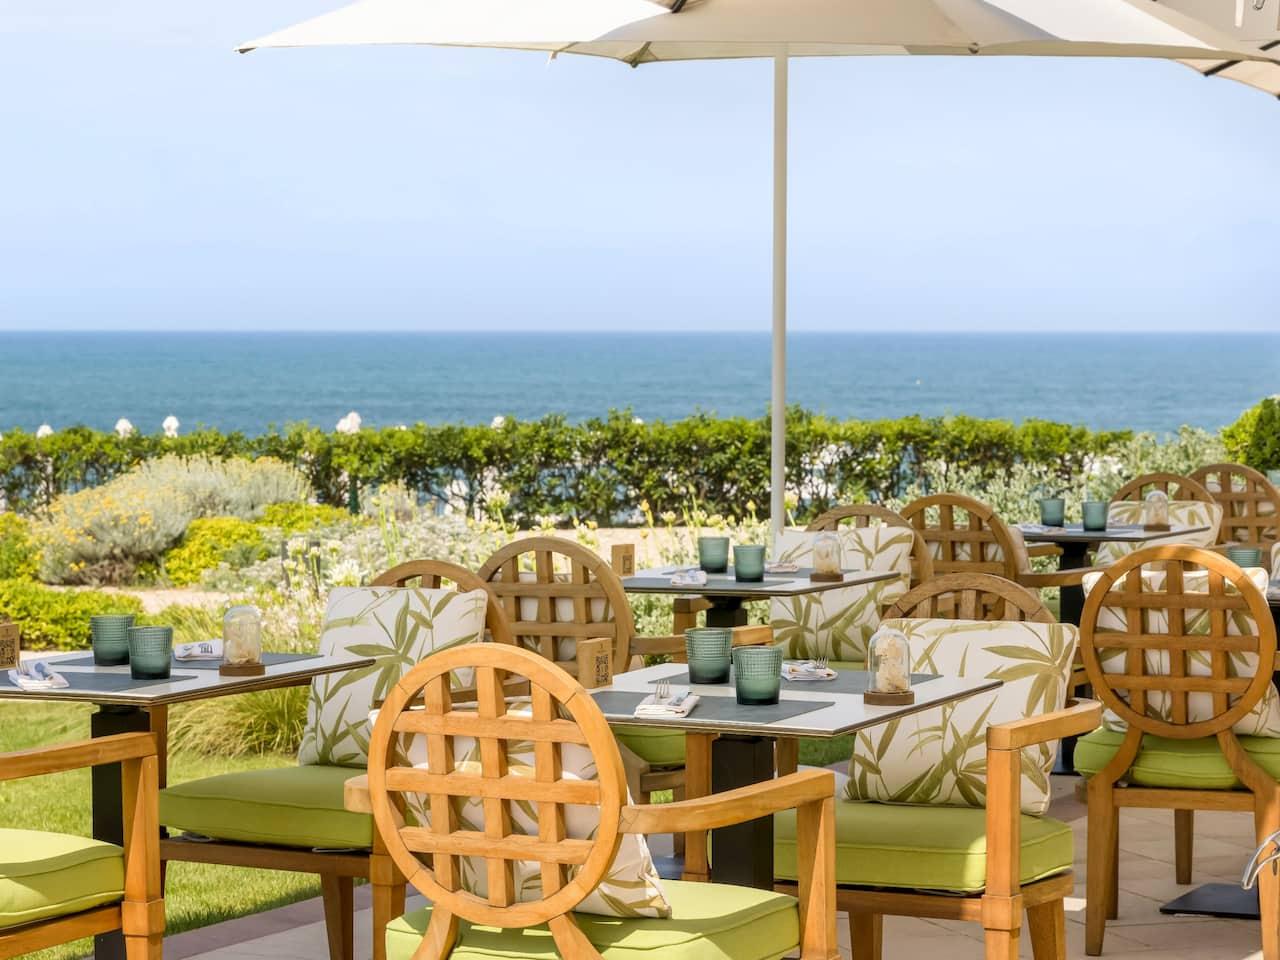 Terrace at Hotel du Palais in Biarritz Sea View